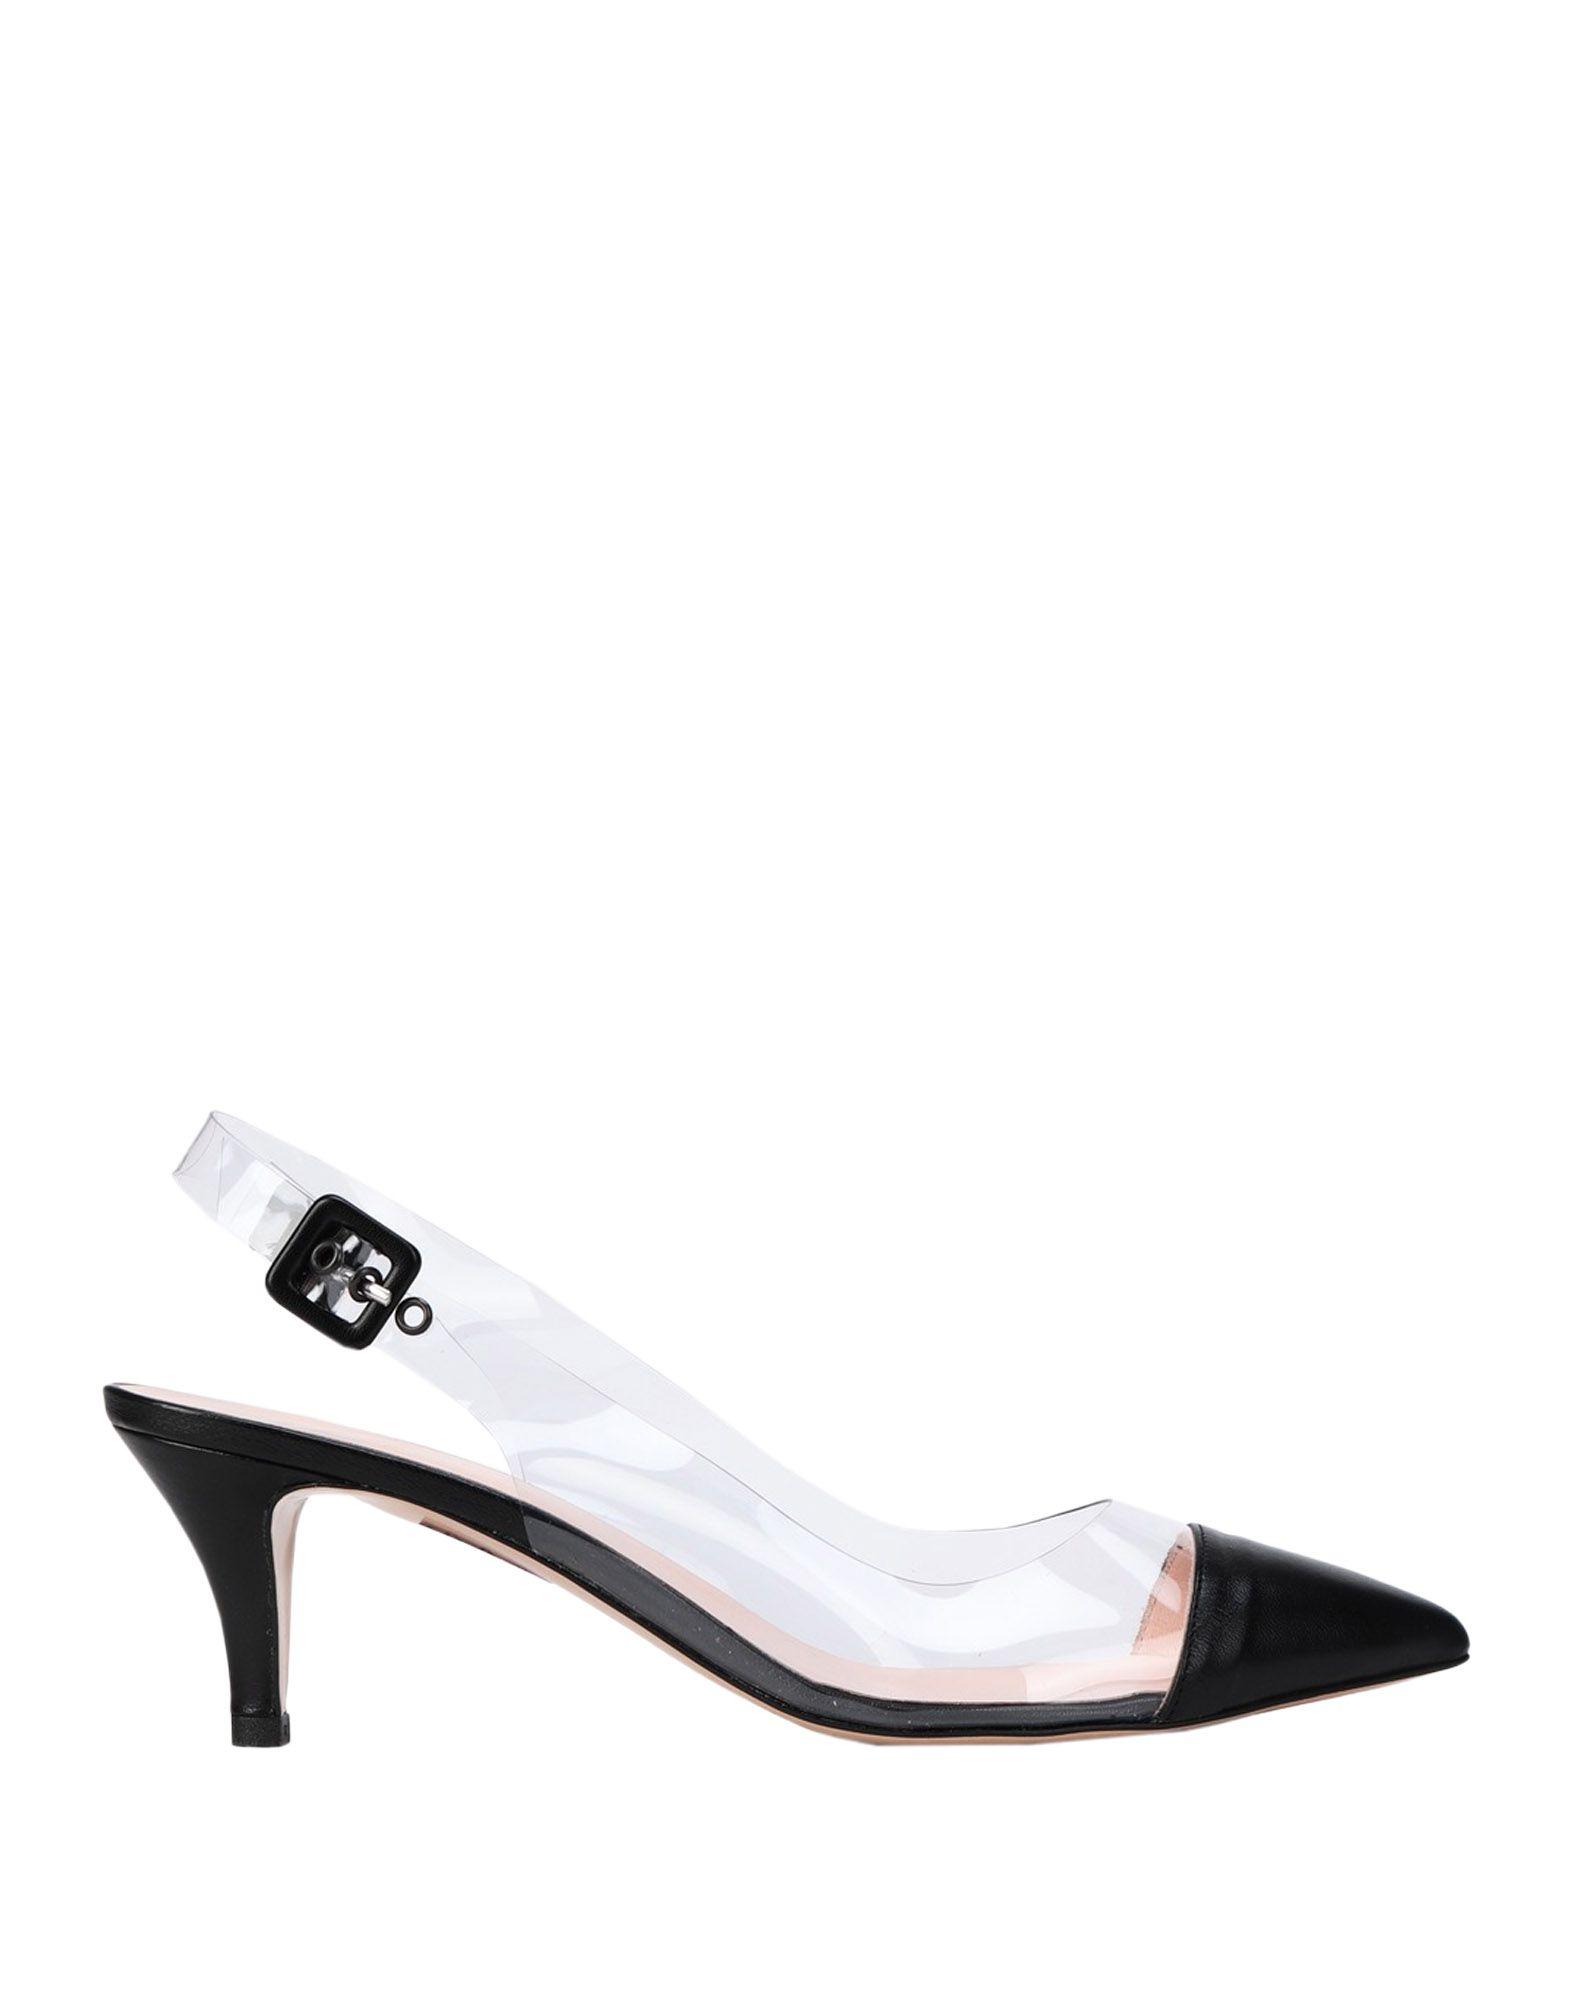 8 by YOOX Туфли туфли с прозрачным каблуком бренд